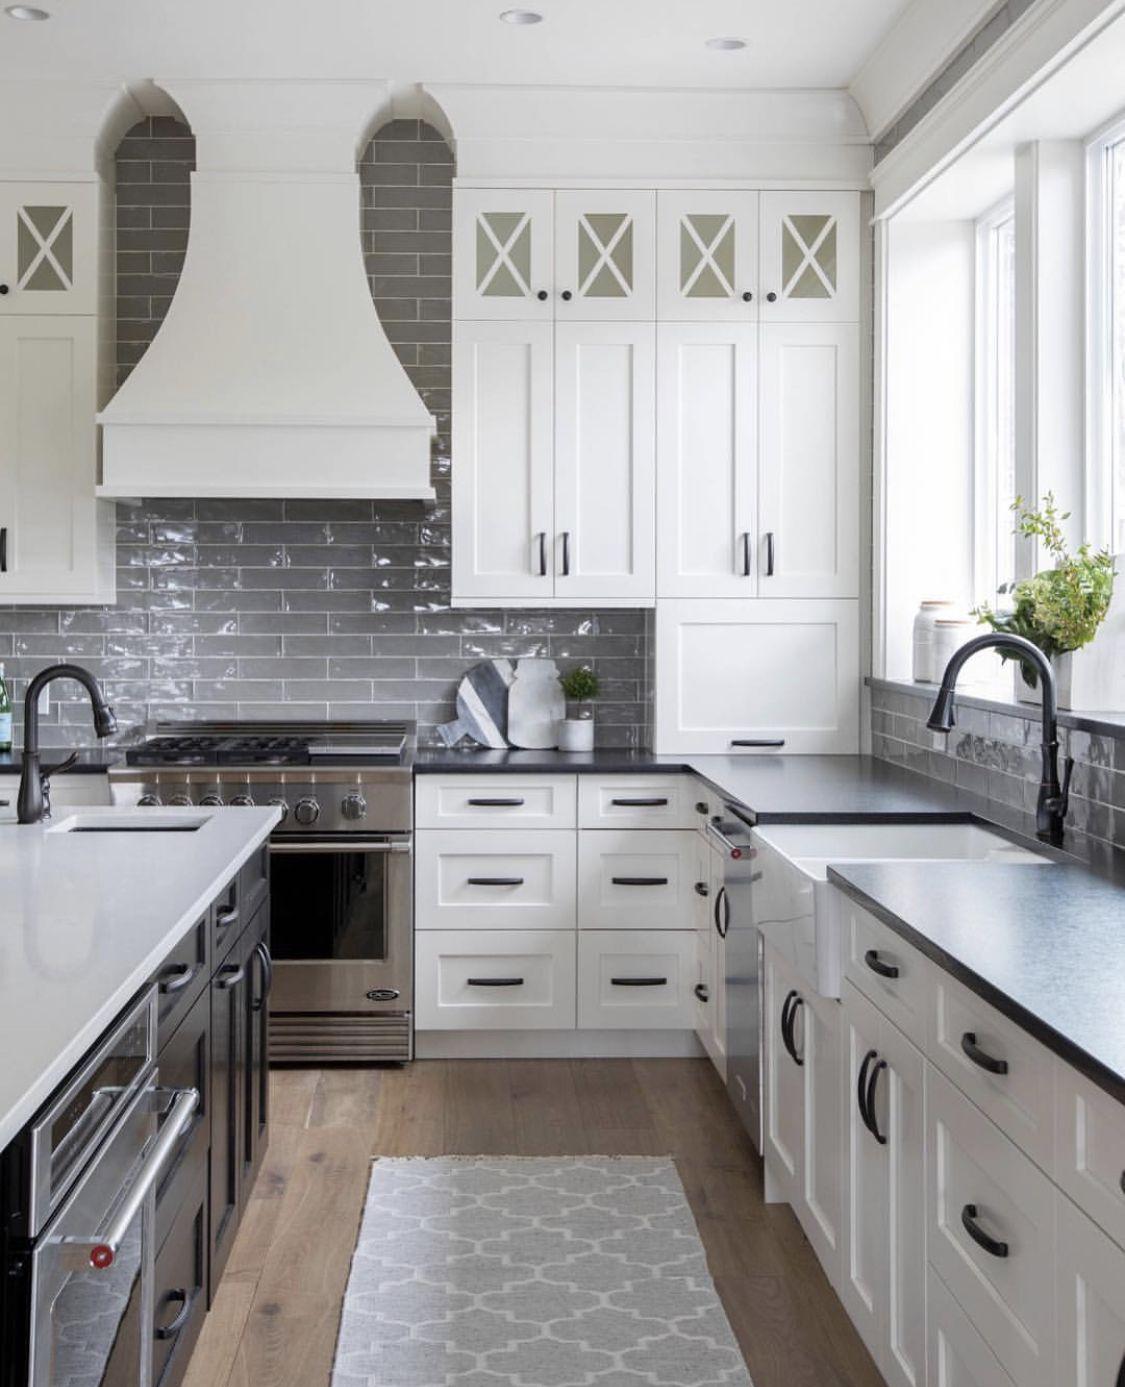 Grey And White Kitchen Modernfarmhouse Kitchen Kitchen Layout Kitchen Interior Gray And White Kitchen